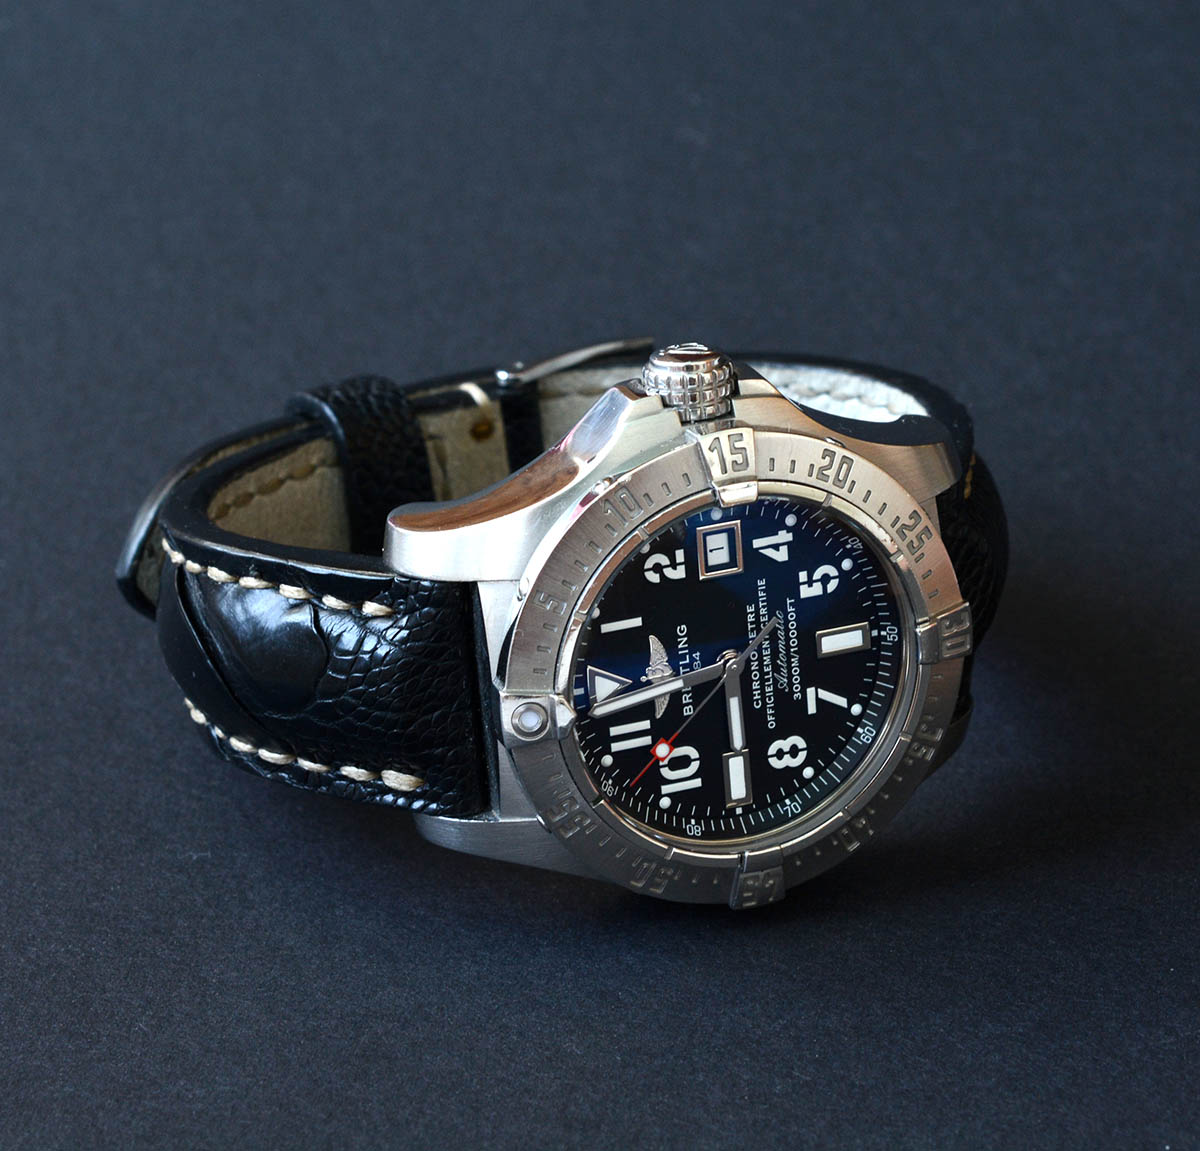 Name:  Breitling_Watch_Strap_Vladstraps-1.JPG Views: 30 Size:  186.2 KB